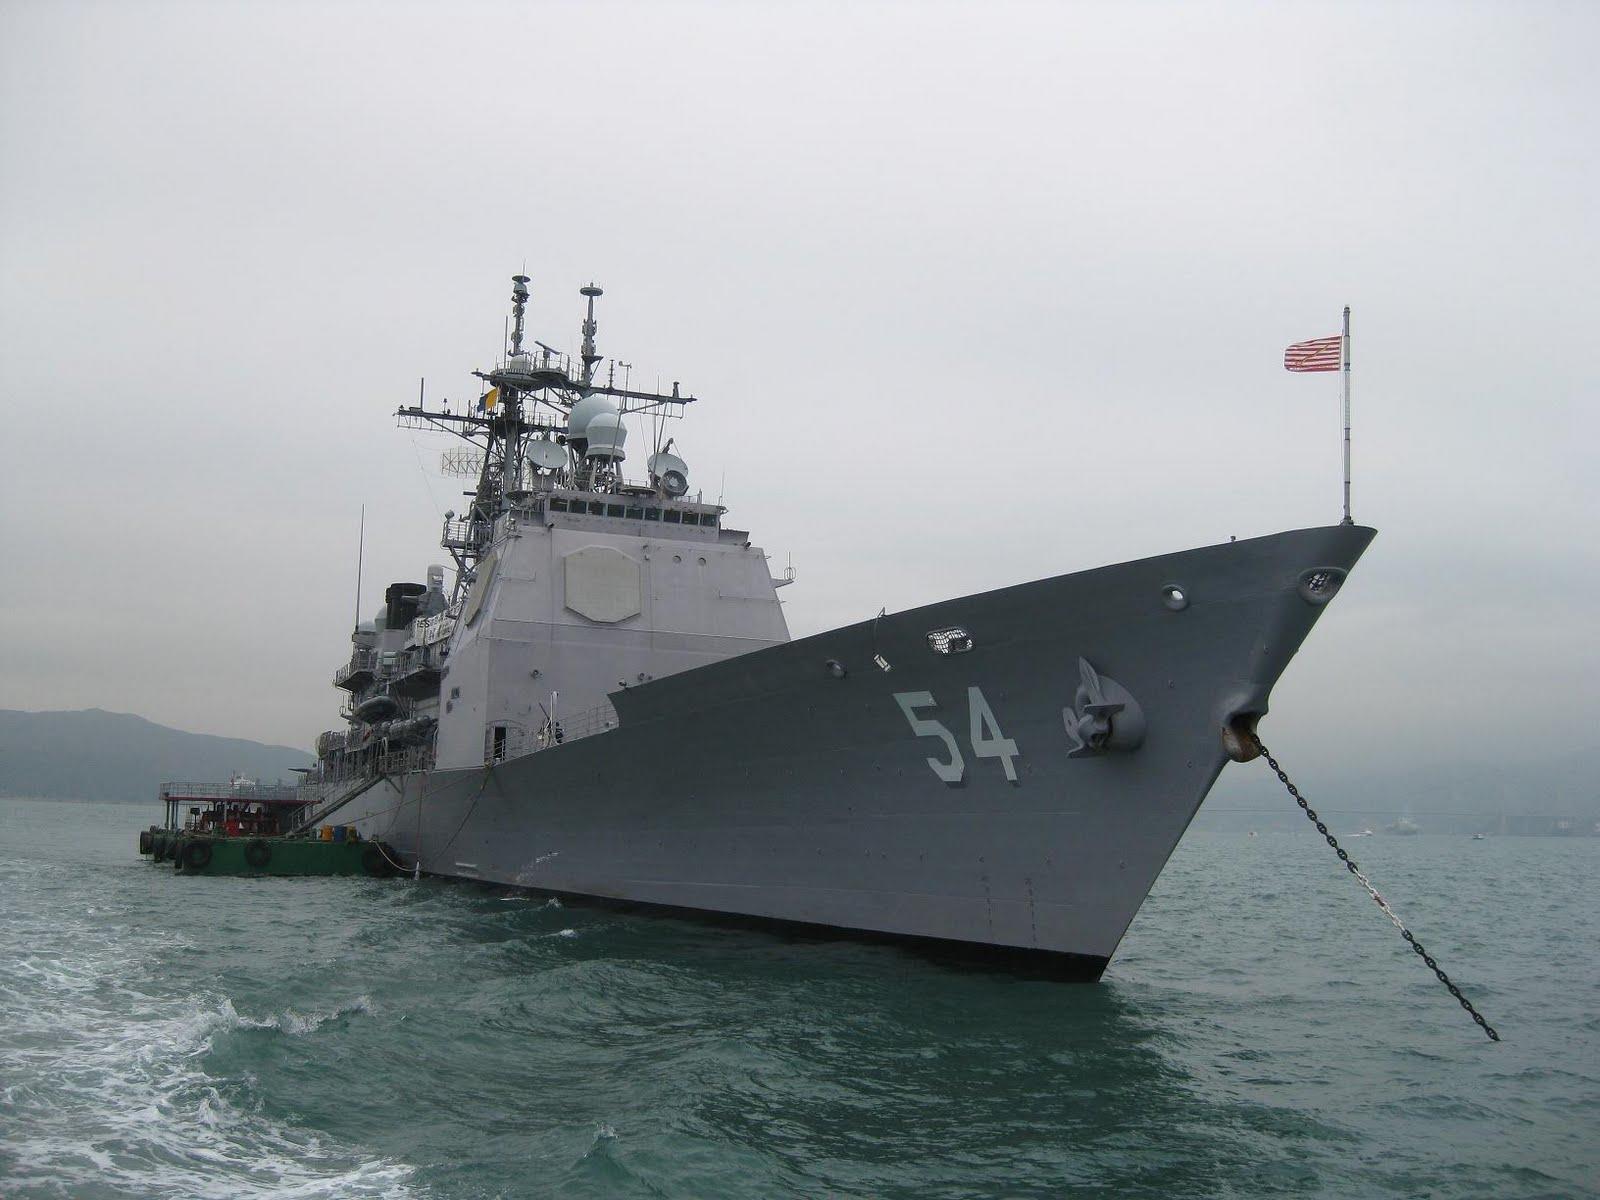 The Navy Christian: USS Antietam Tour: A photo tour